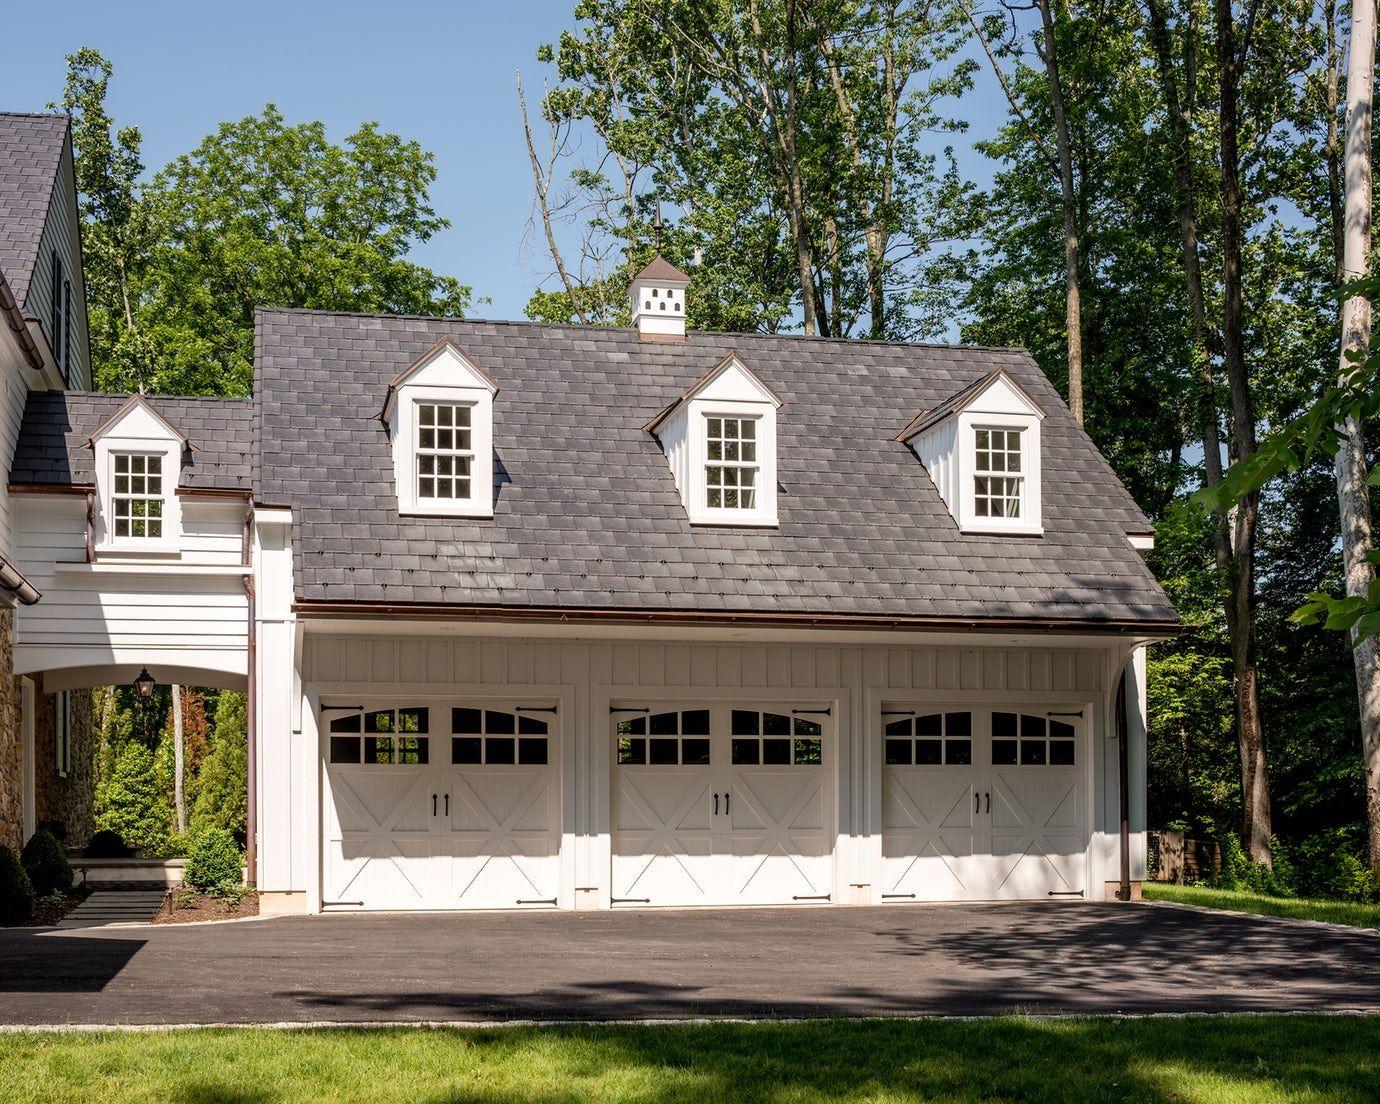 Carriage House Style Garage Attached To Pennsylvania Farmhouse